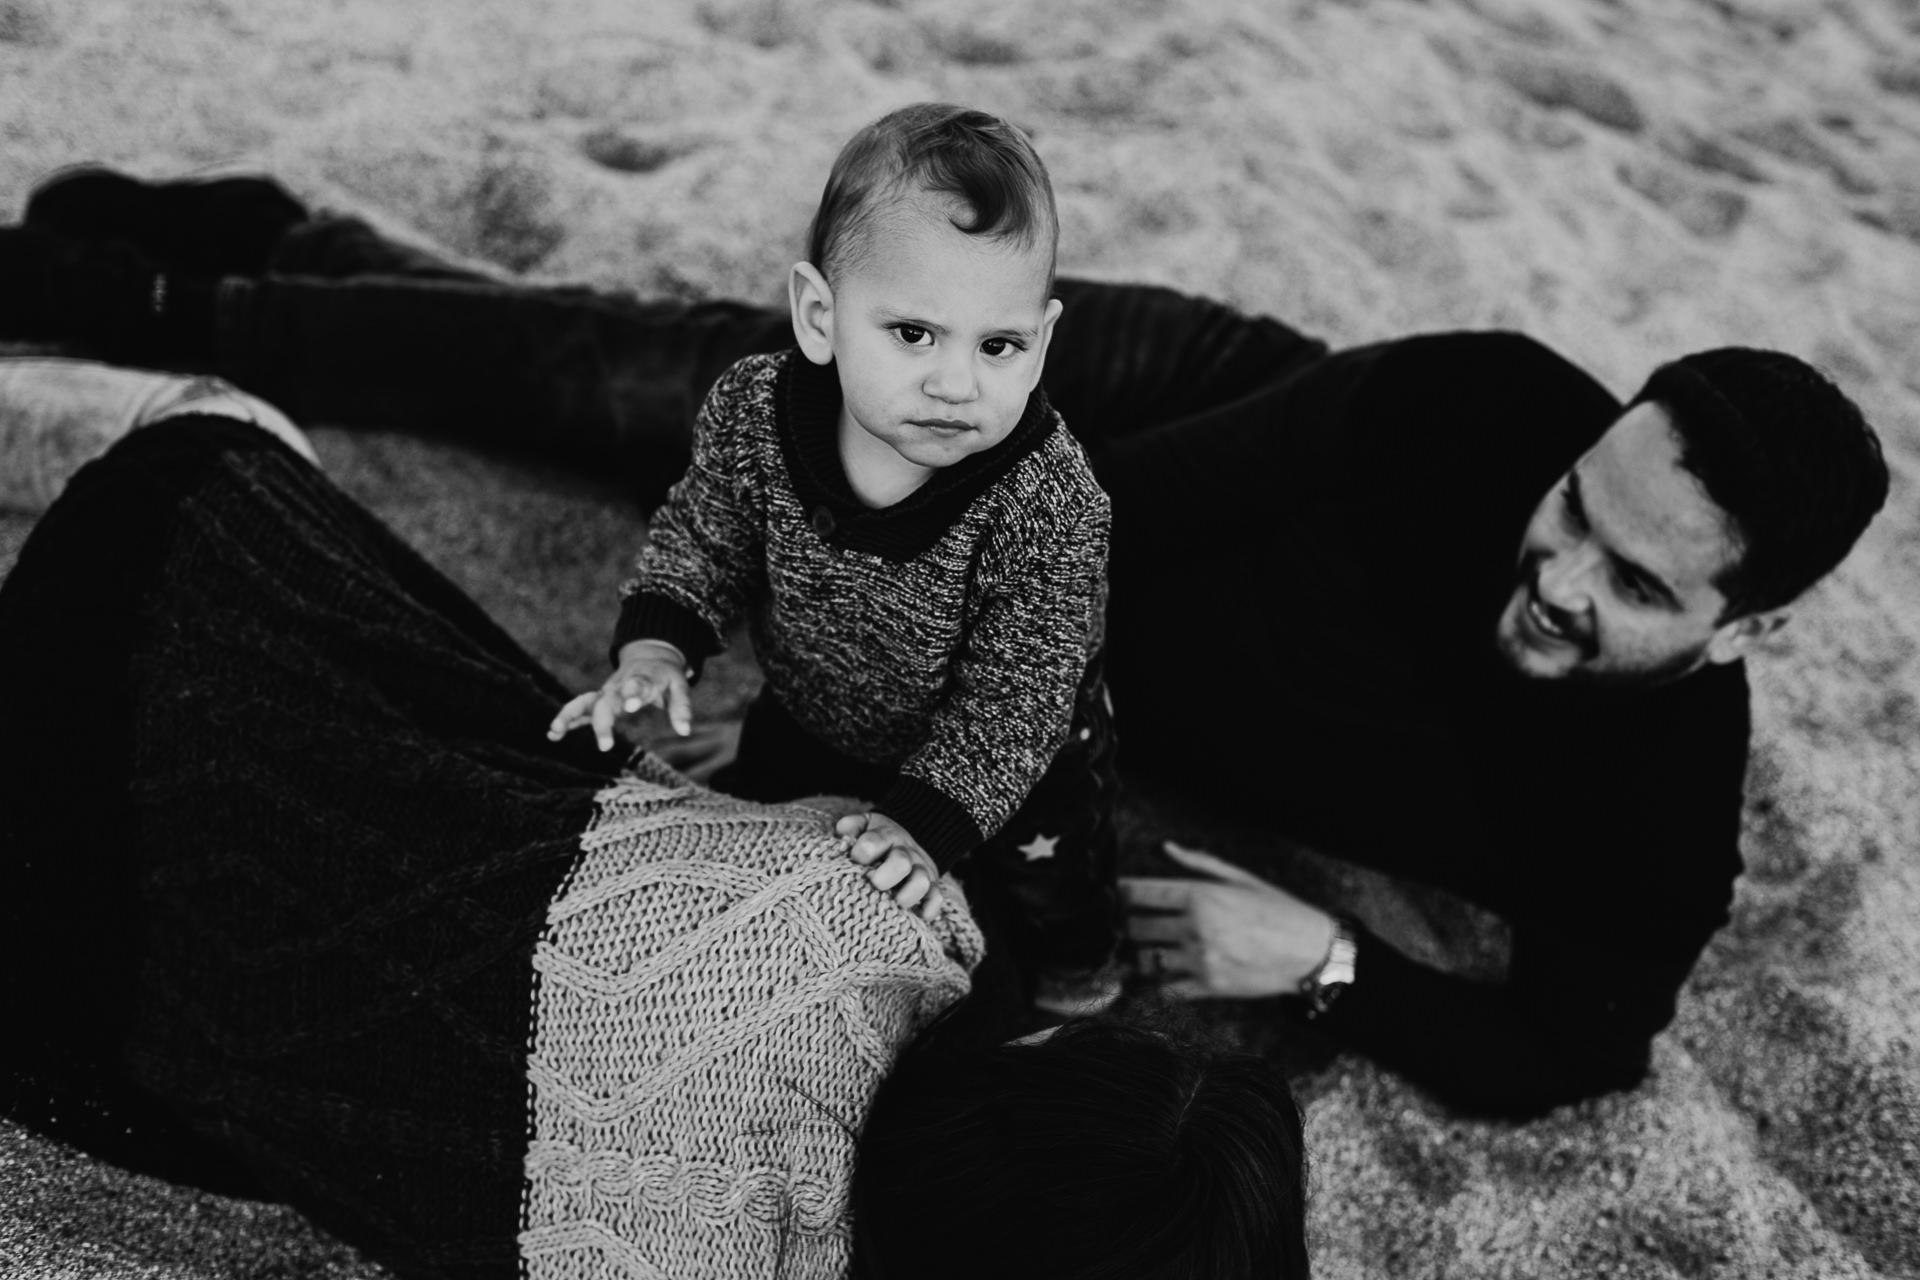 sesion de fotos infantil playa pont petroli badalona